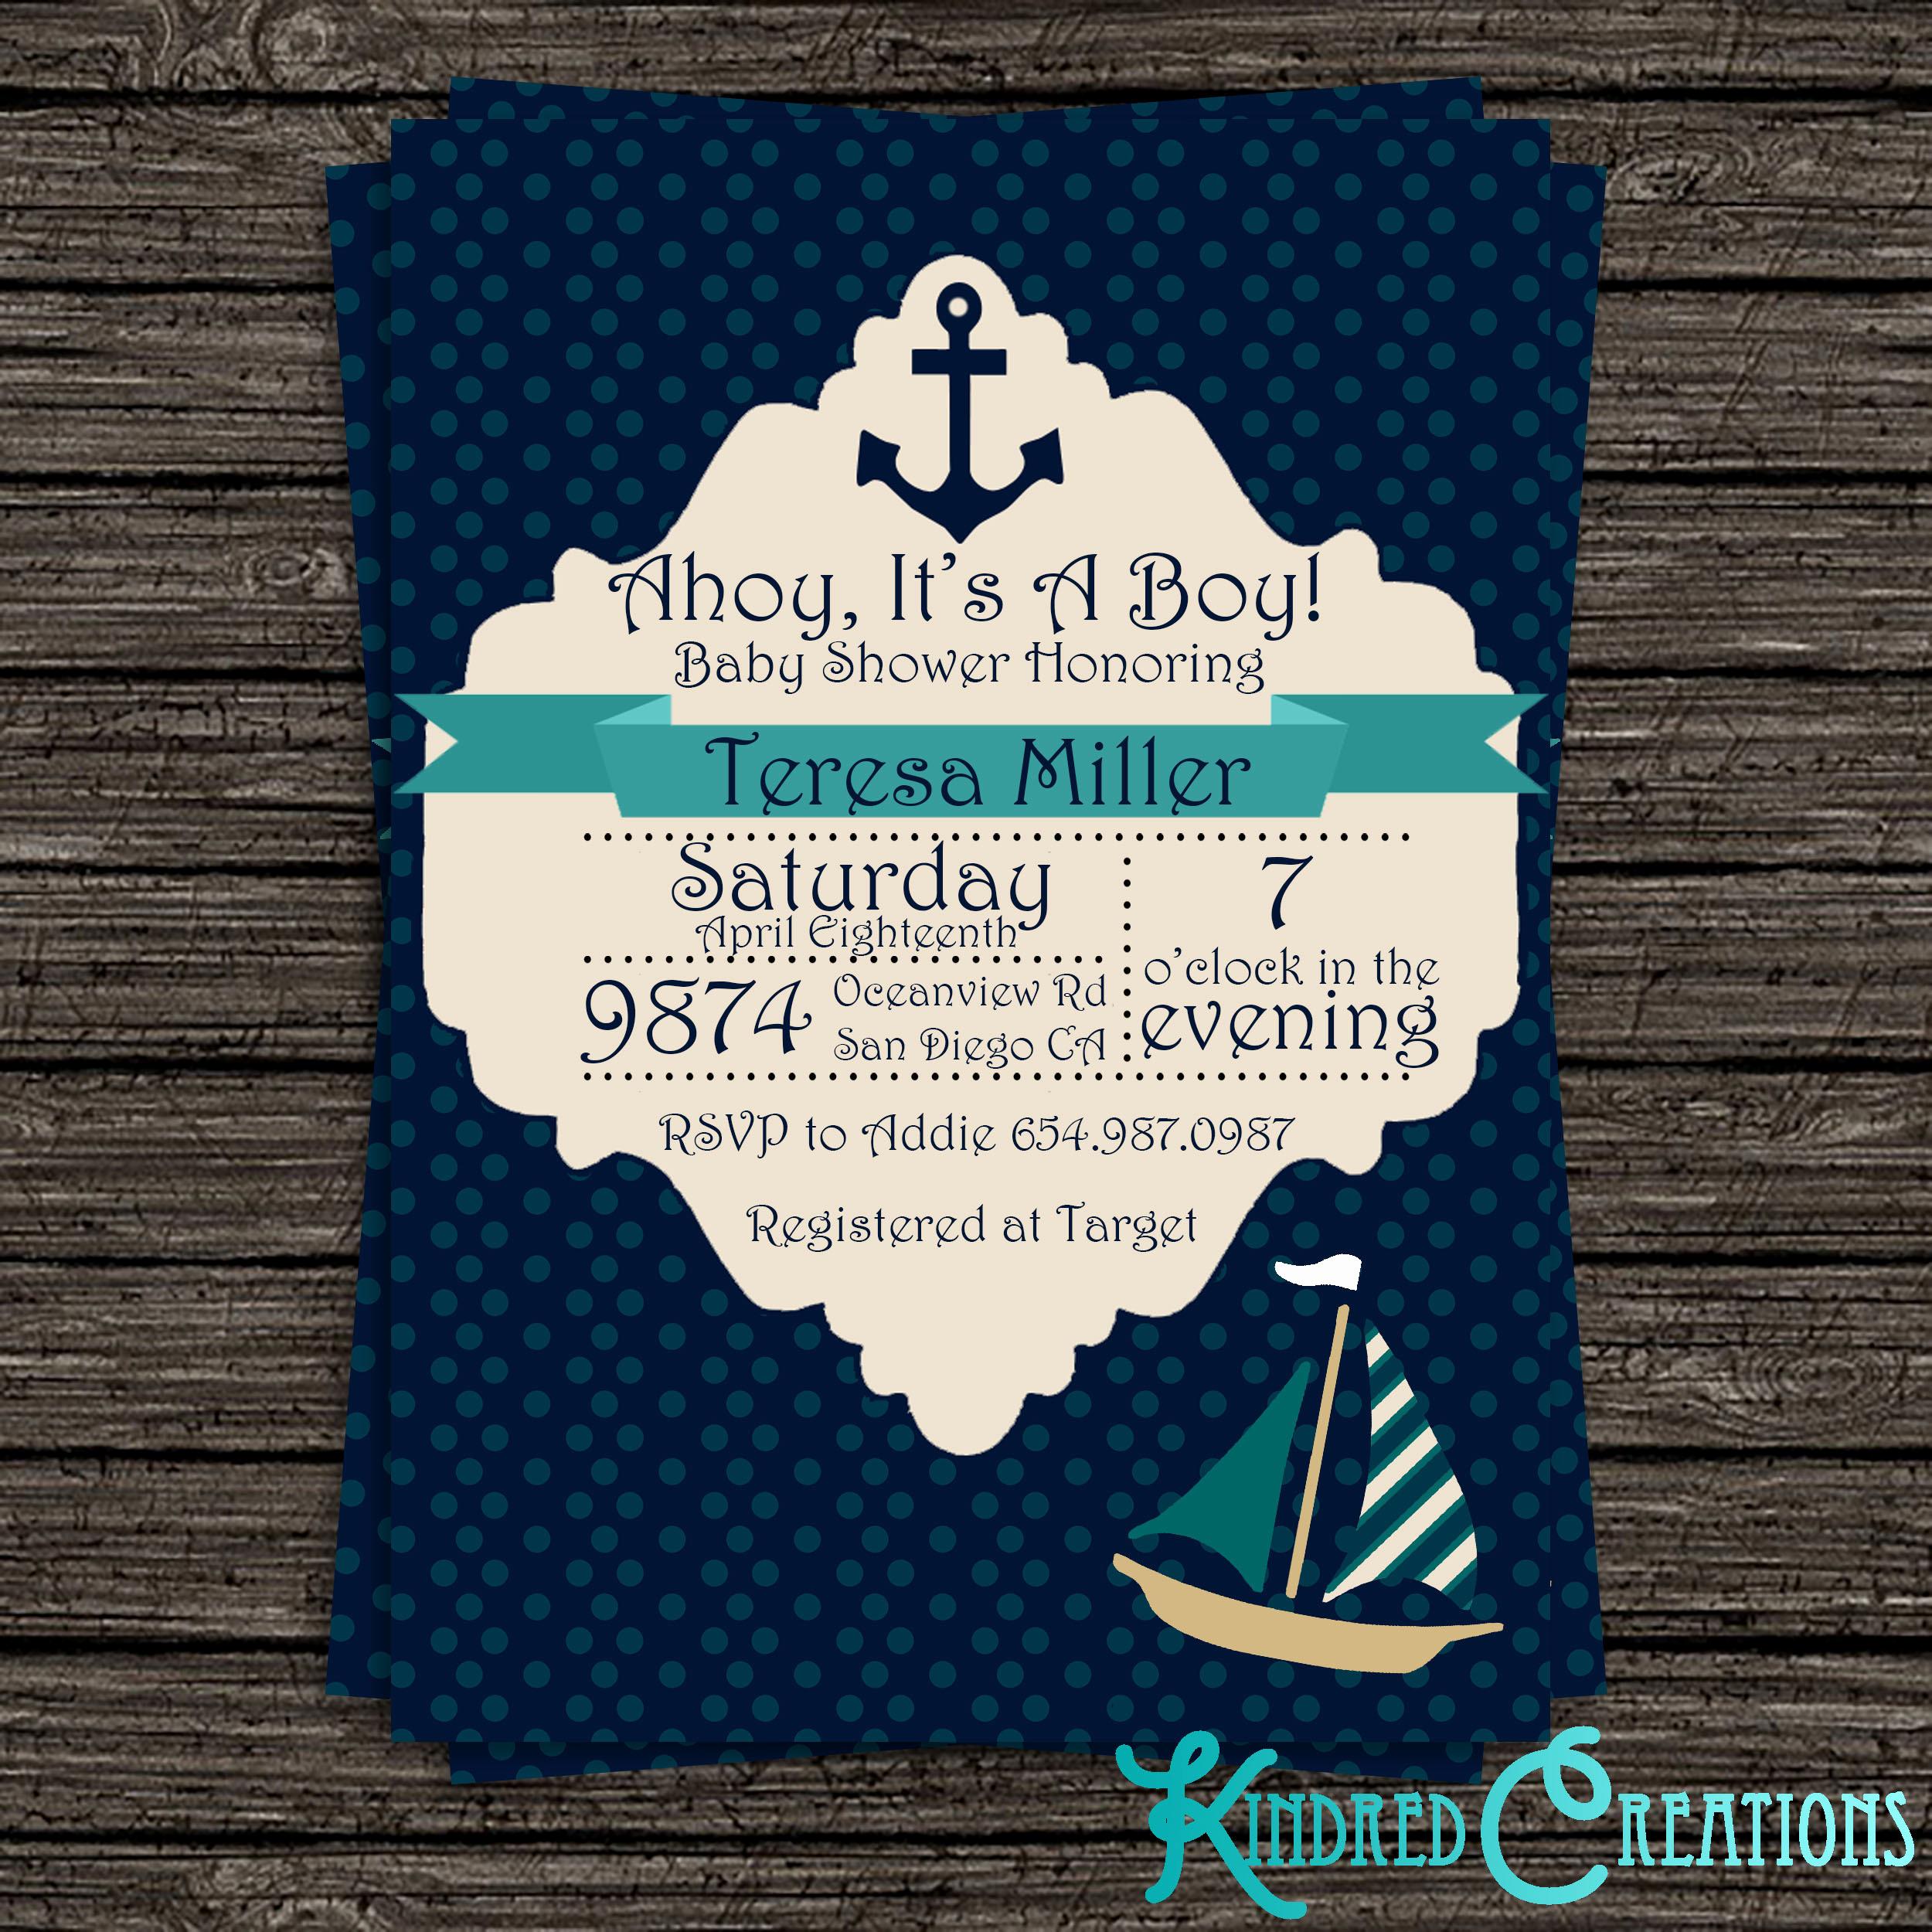 Boy Baby Shower Invitation Beautiful Nautical Baby Boy Shower Invitation Kindred Creations